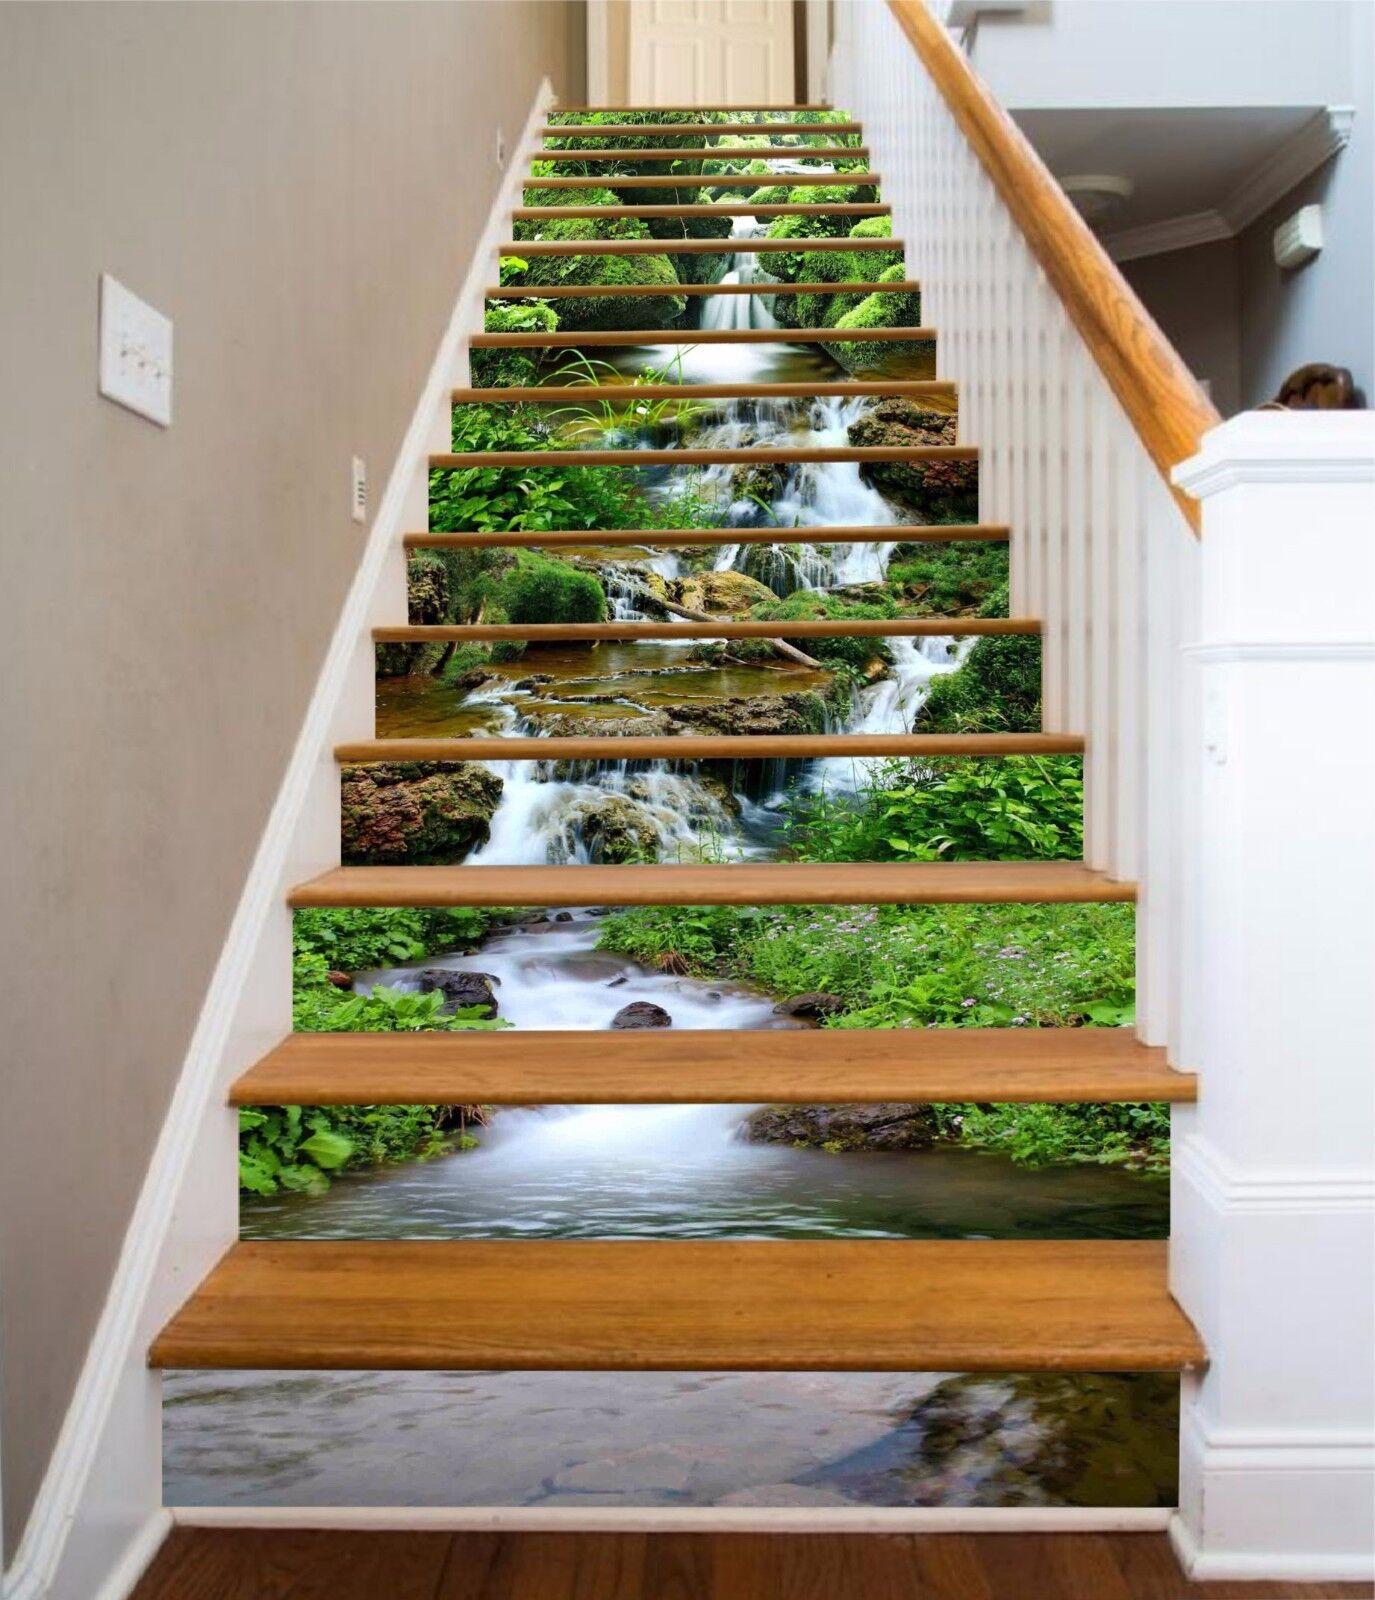 3D Moss Plant River 575 Risers Decoration Photo Mural Vinyl Decal Wallpaper CA